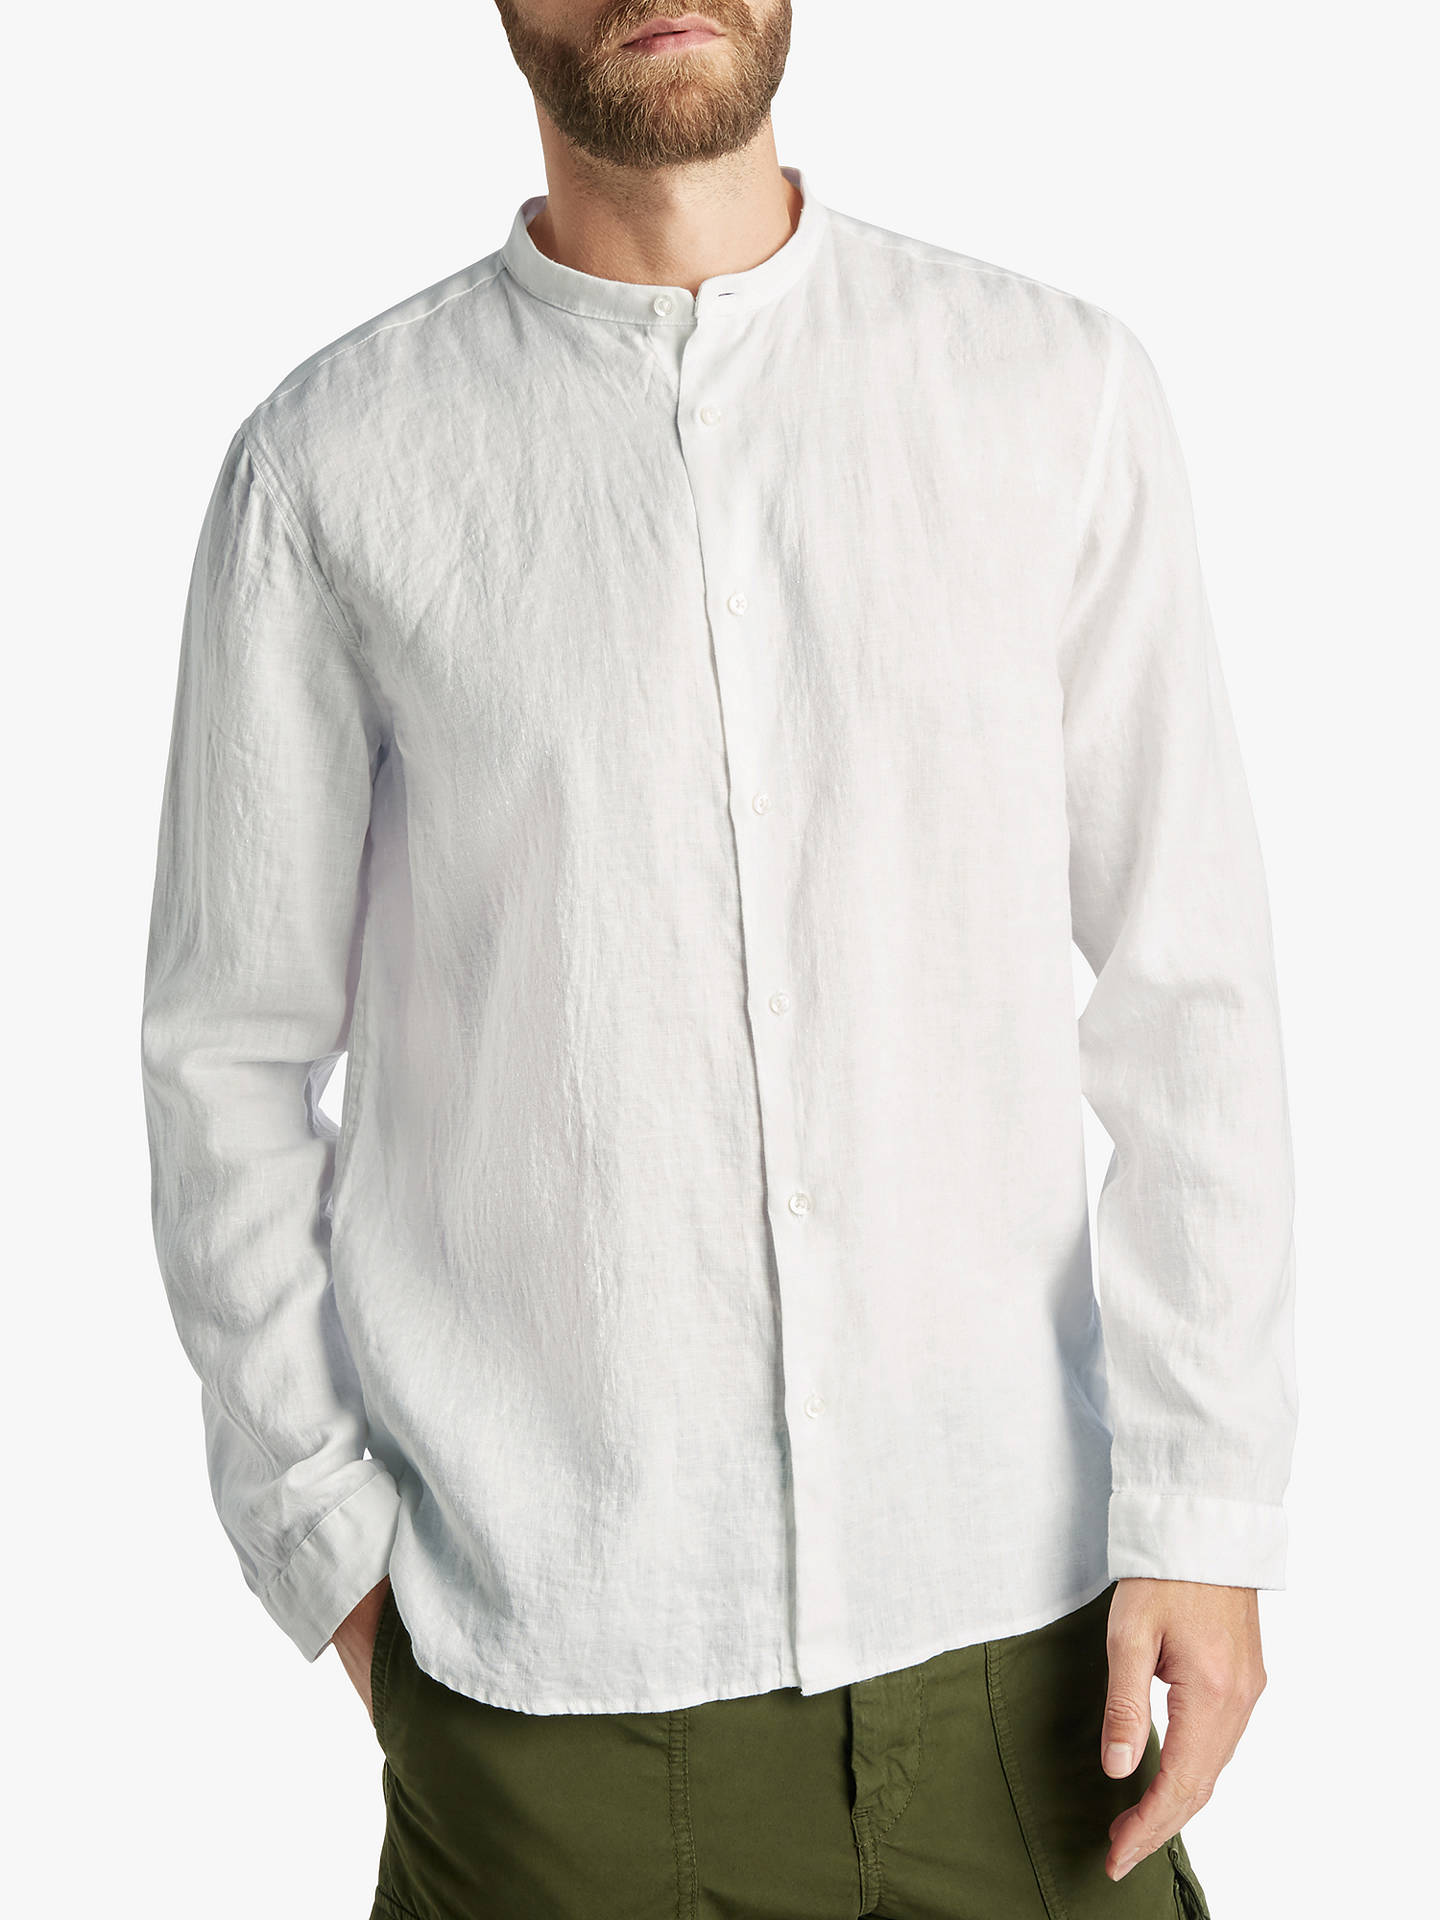 b8b0169b4 HUGO by Hugo Boss Eddison-W Stand Collar Linen Shirt, White at John ...